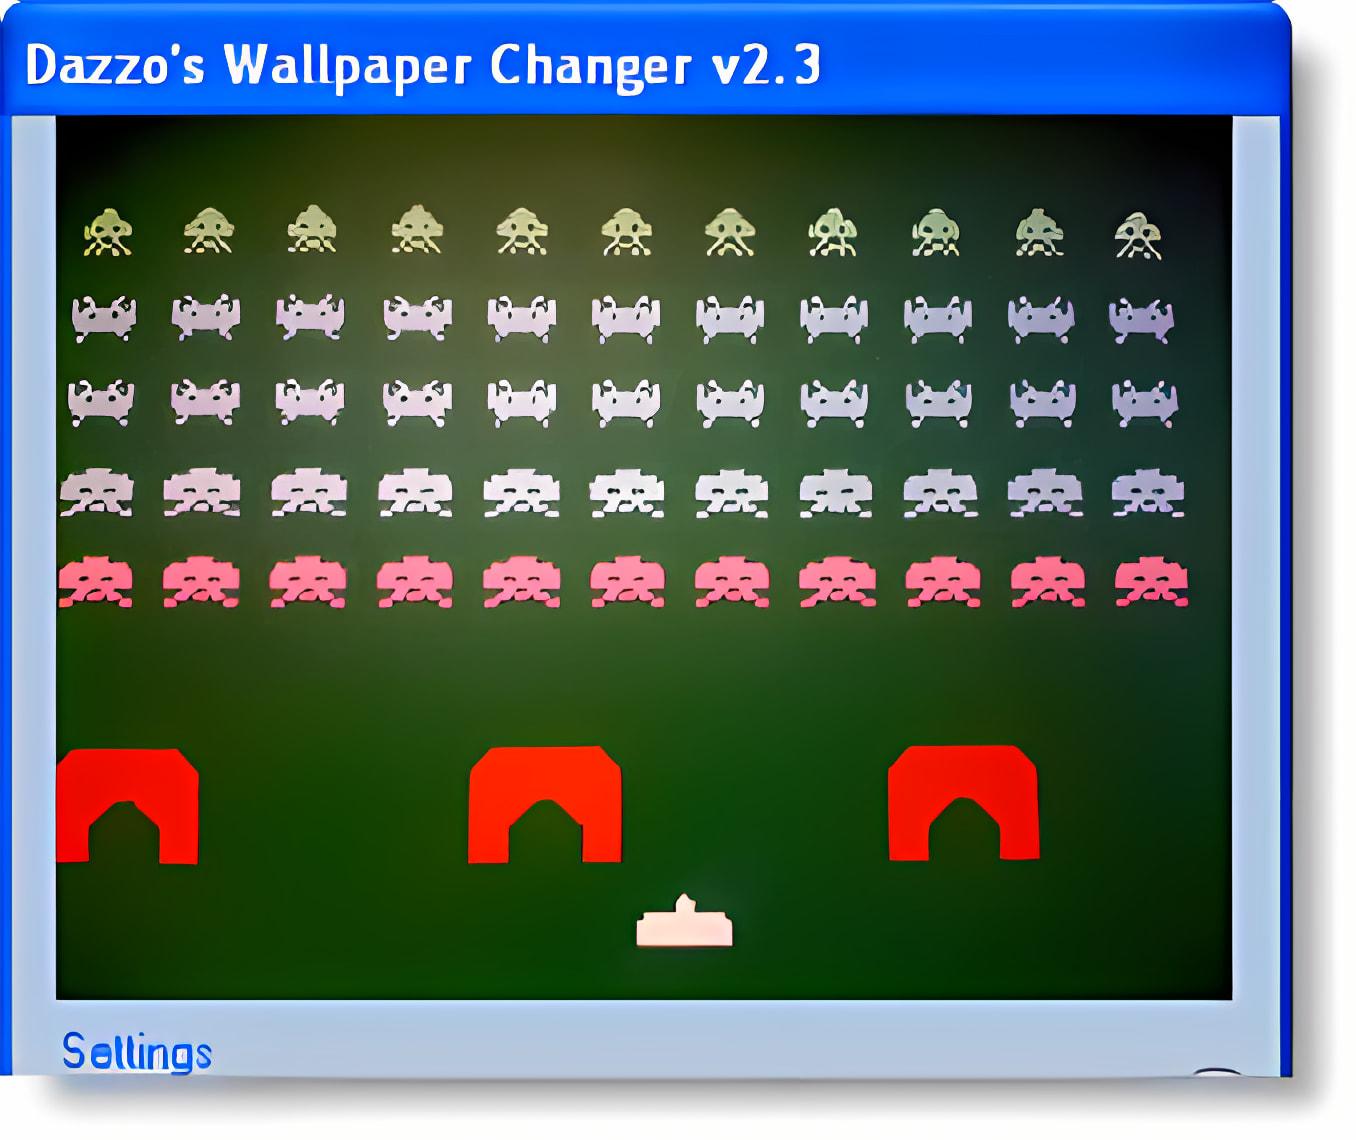 Dazzo's Wallpaper Changer